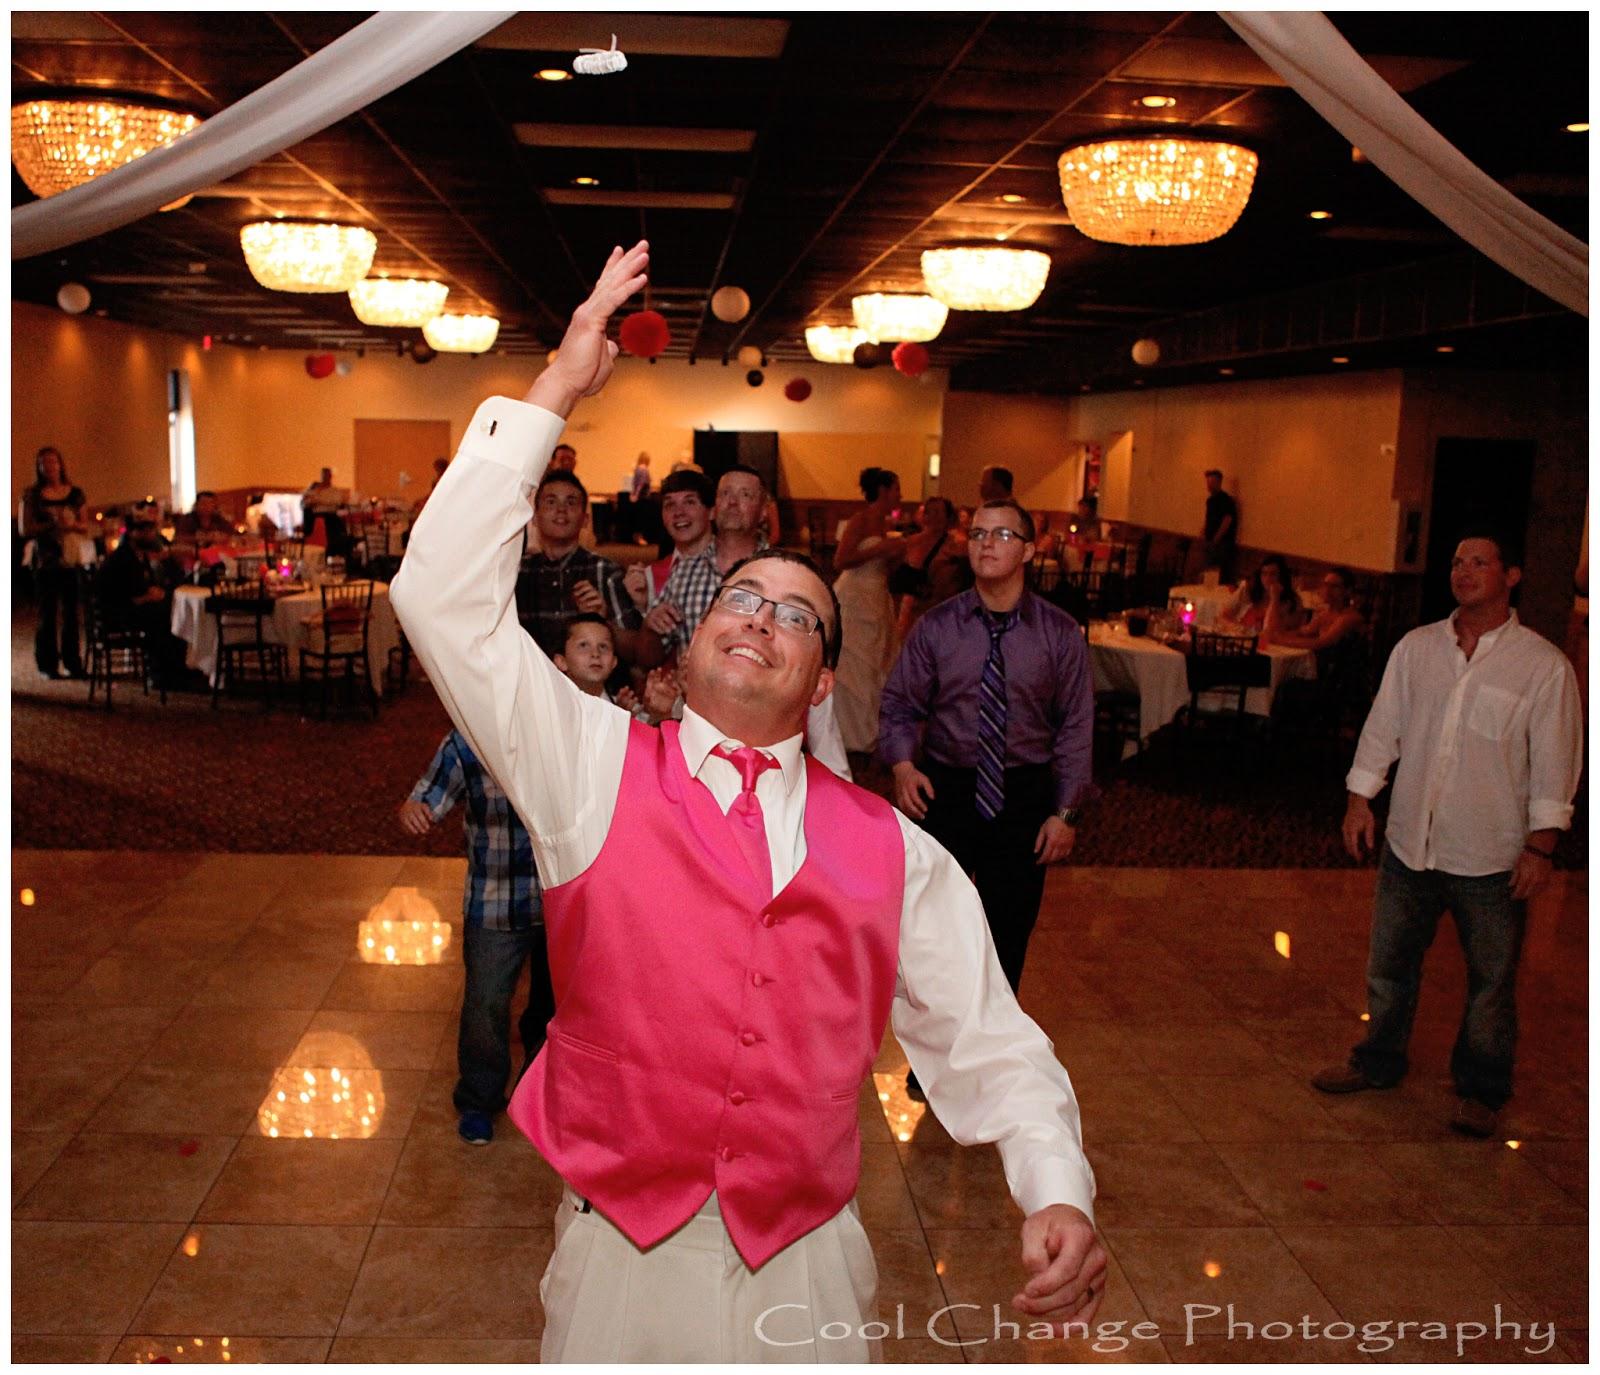 Wedding Photography: The